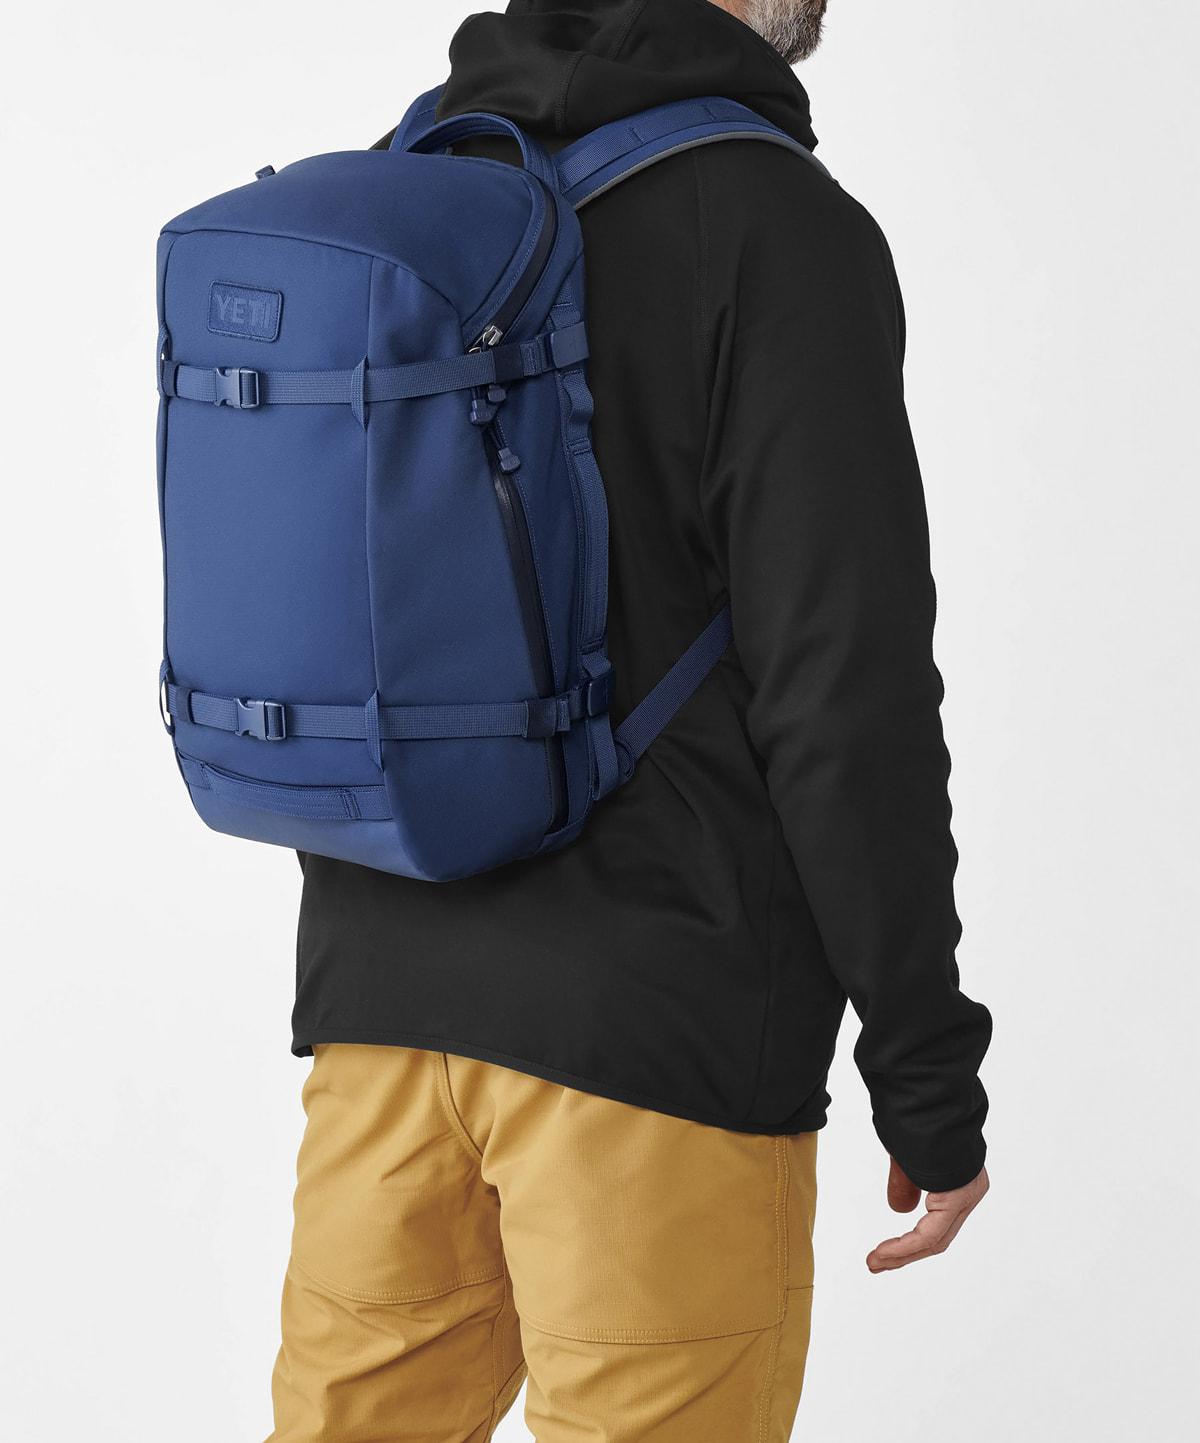 Crossroads Backpack by Yeti